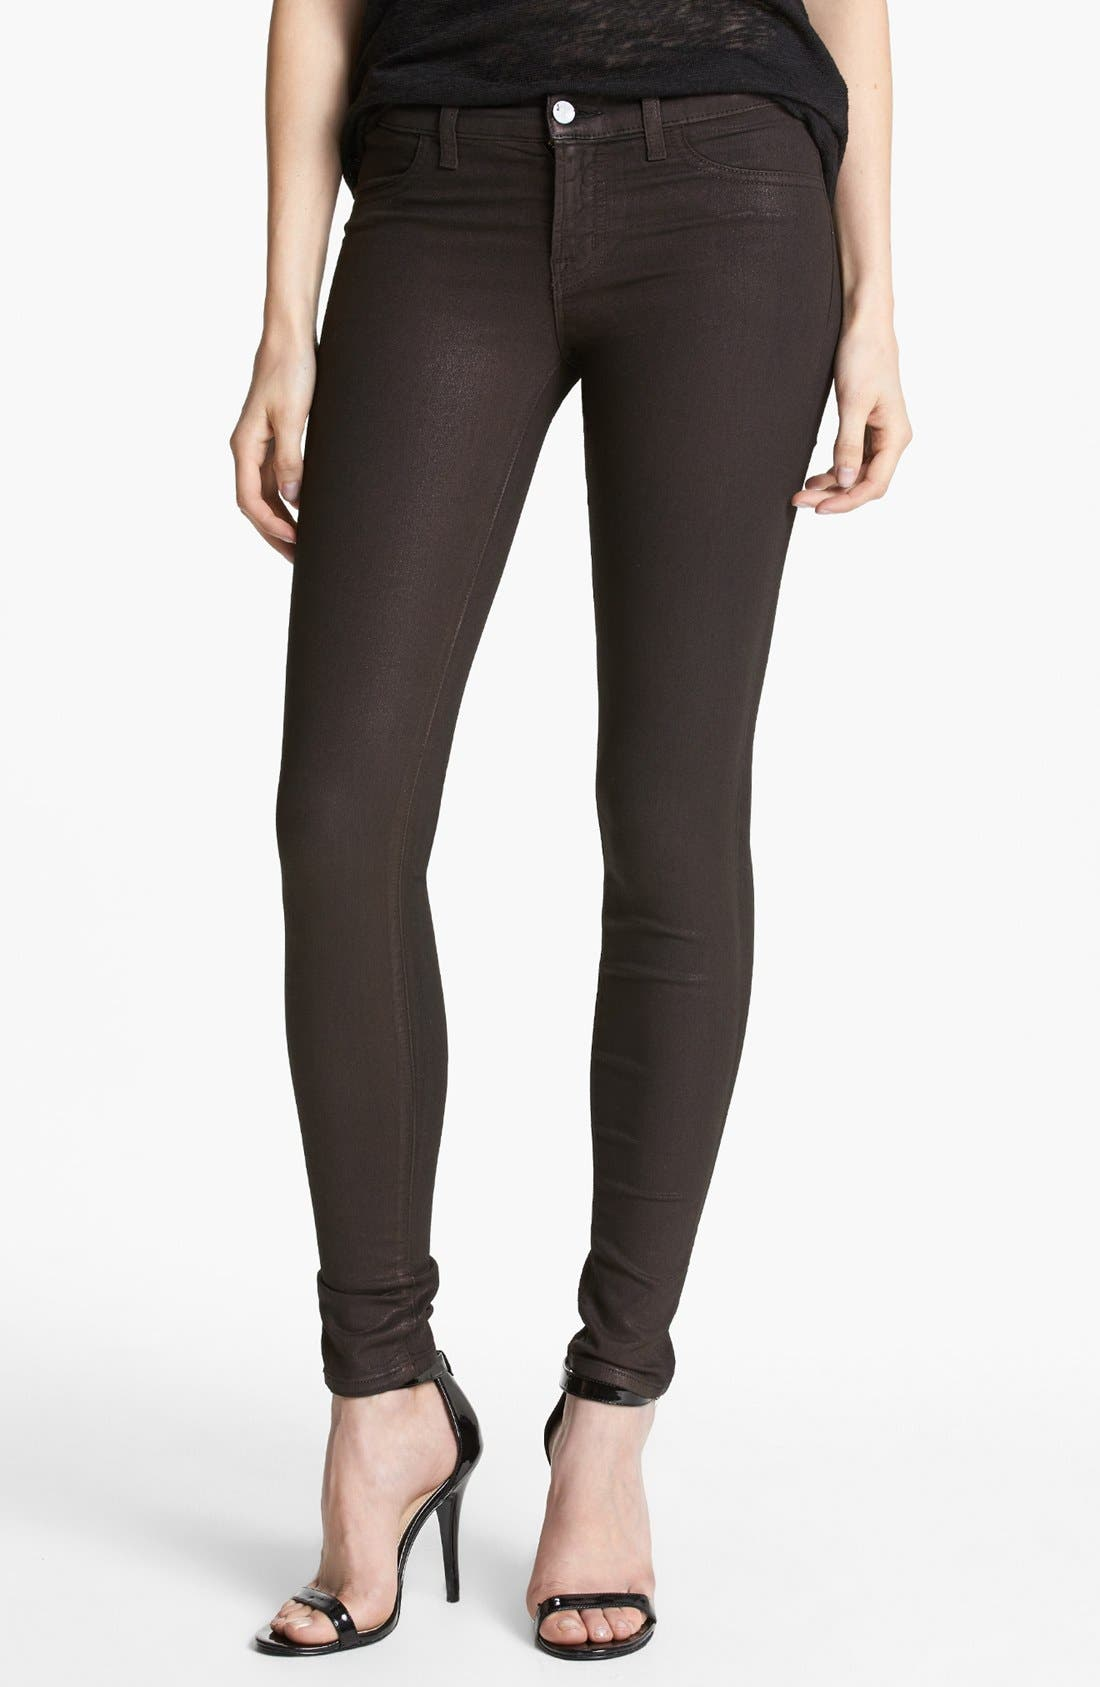 Alternate Image 1 Selected - J Brand '815' Coated Skinny Pants